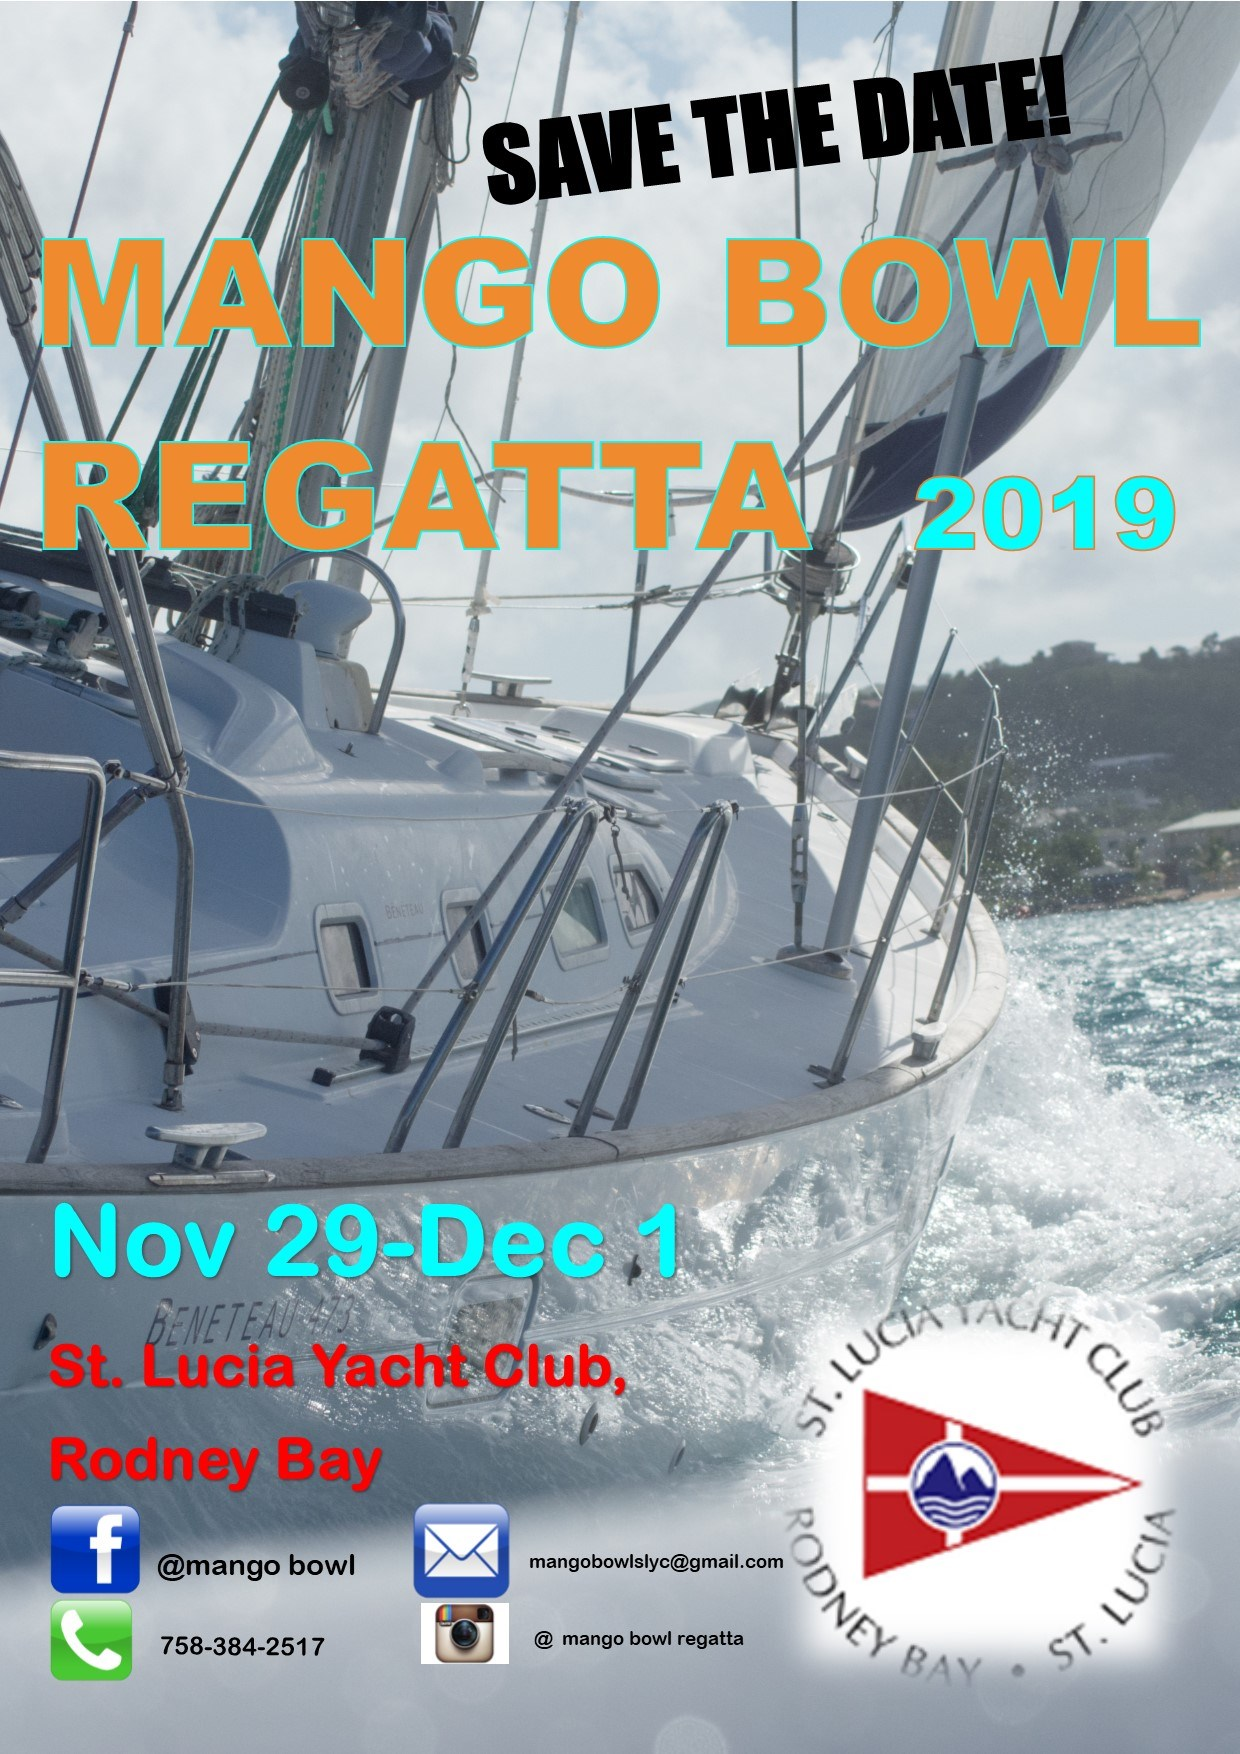 Mango Bowl Regatta 2019 at Saint Lucia Yacht Club sports events yachting race in saint lucia